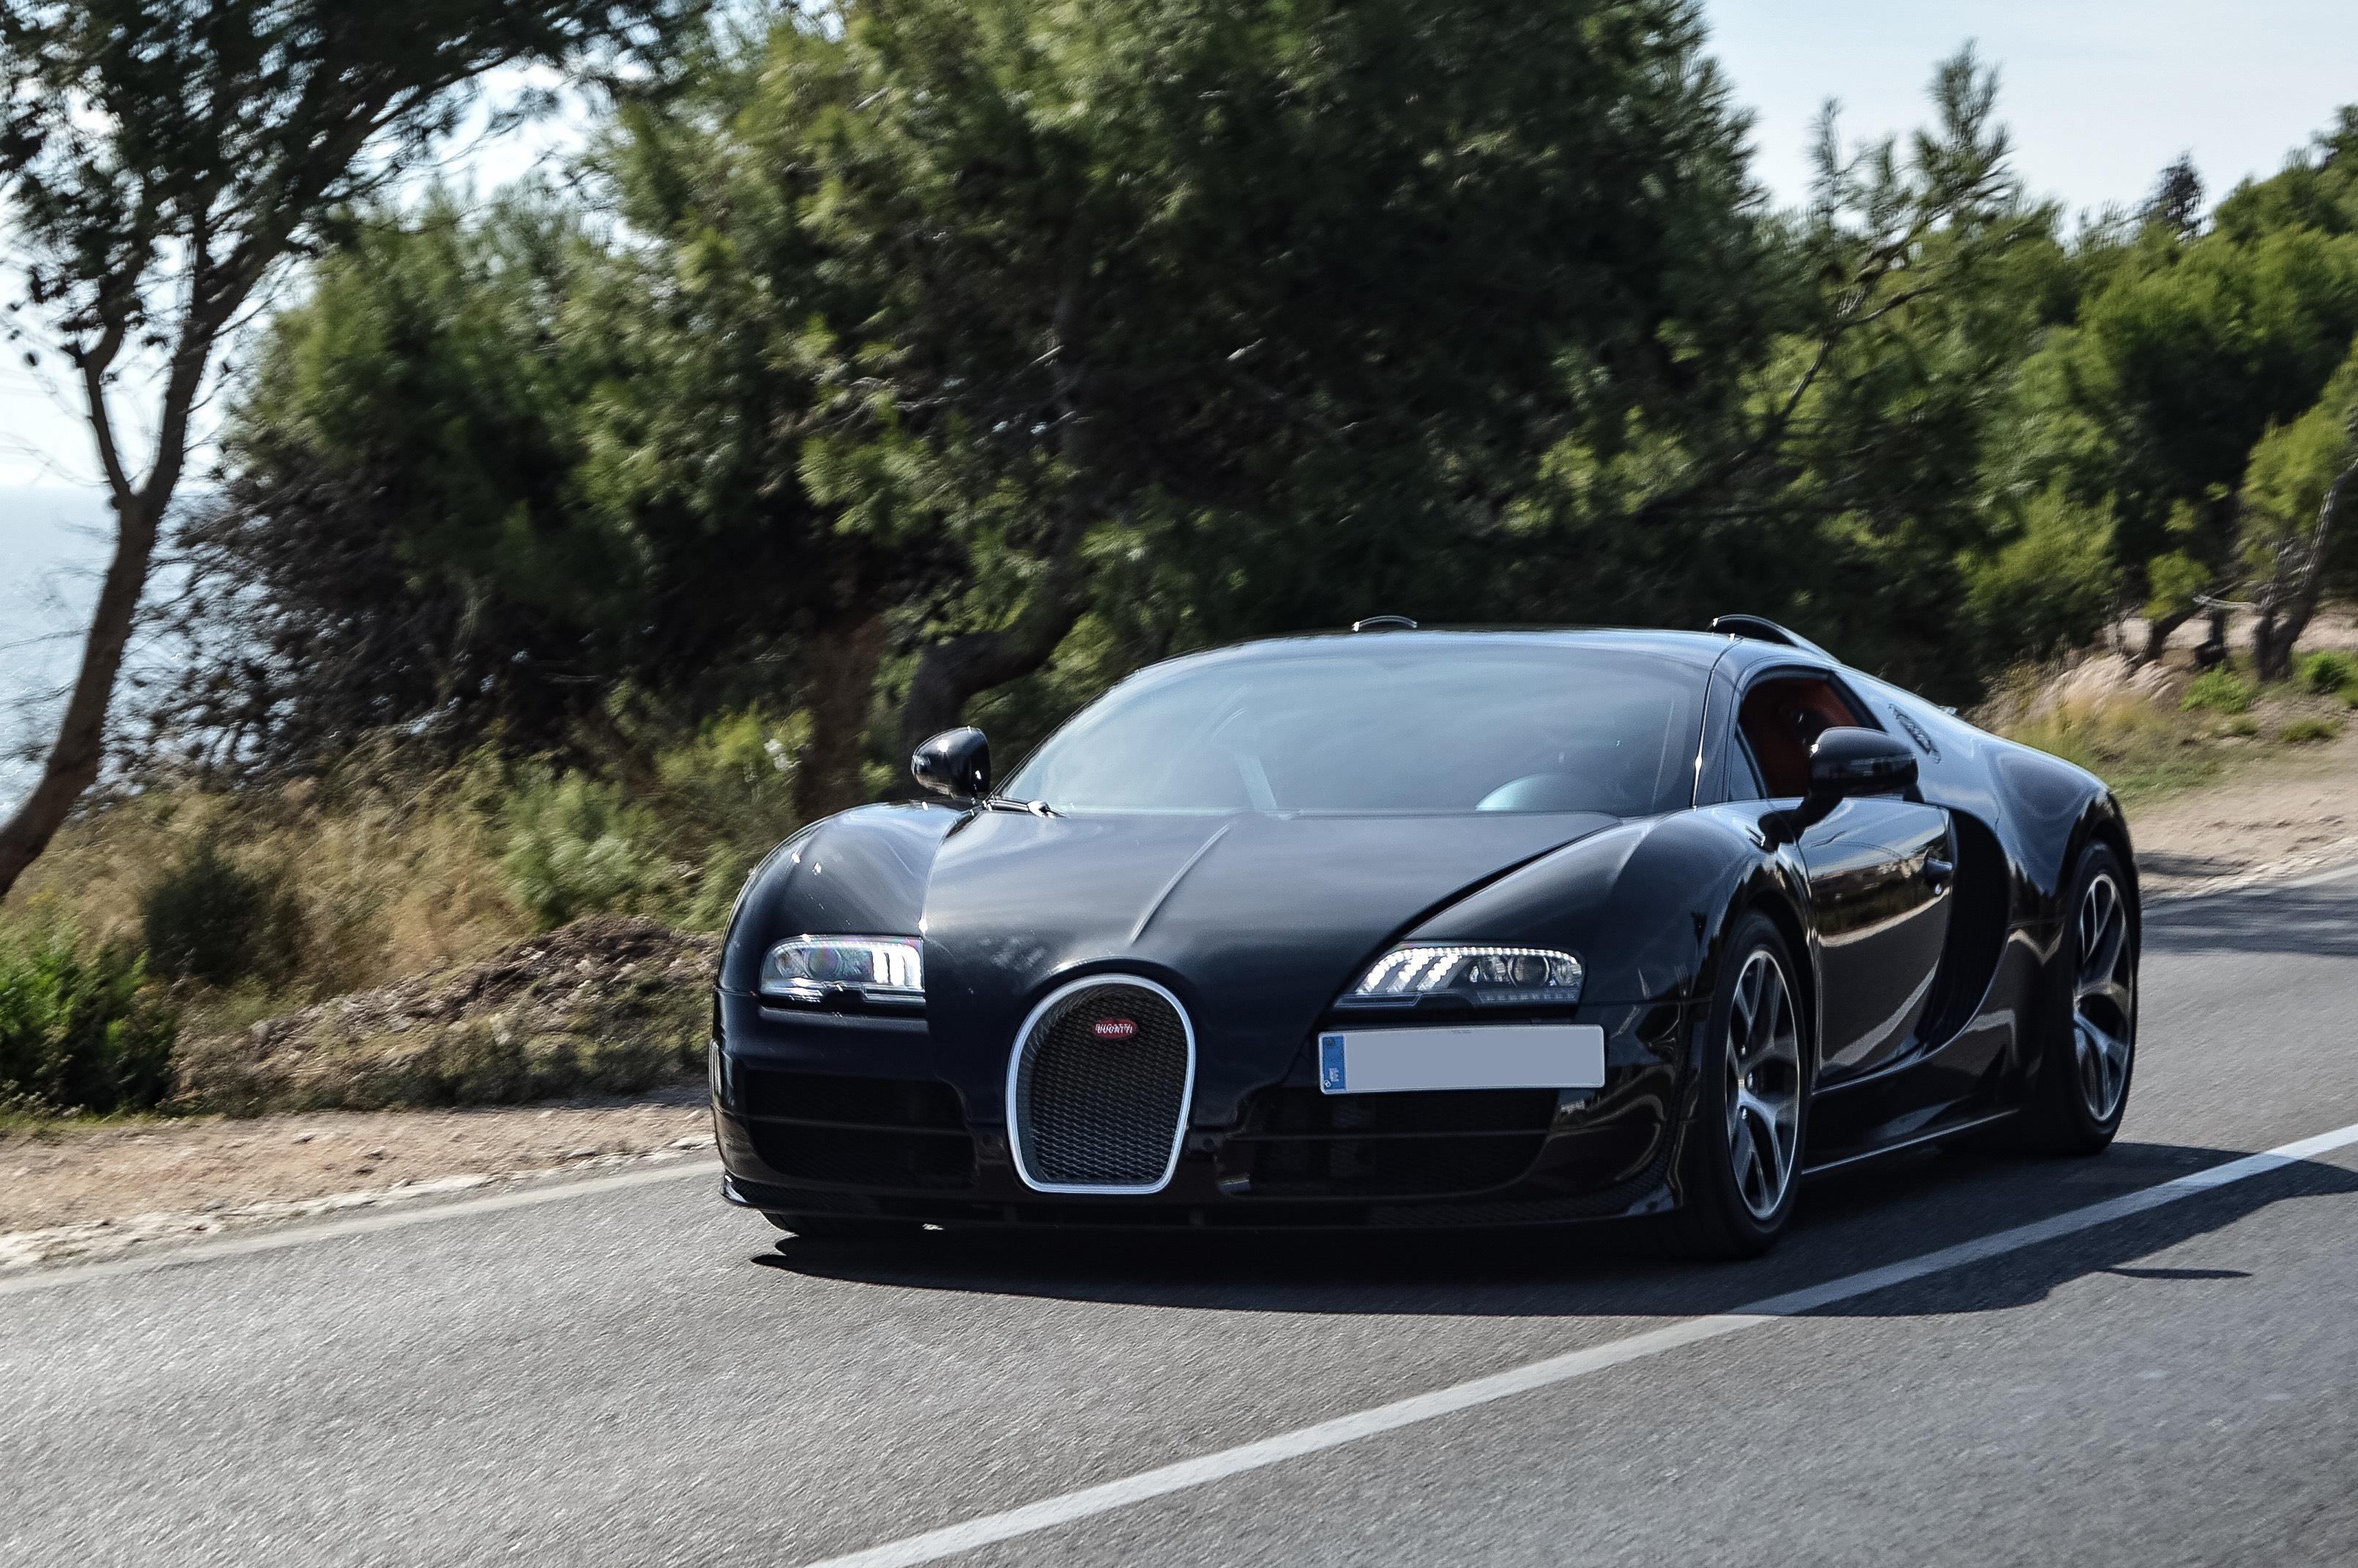 1a6bc187a8b68b79397fd34e5978a2ad Extraordinary Bugatti Veyron Grand Sport Vitesse Cars Trend